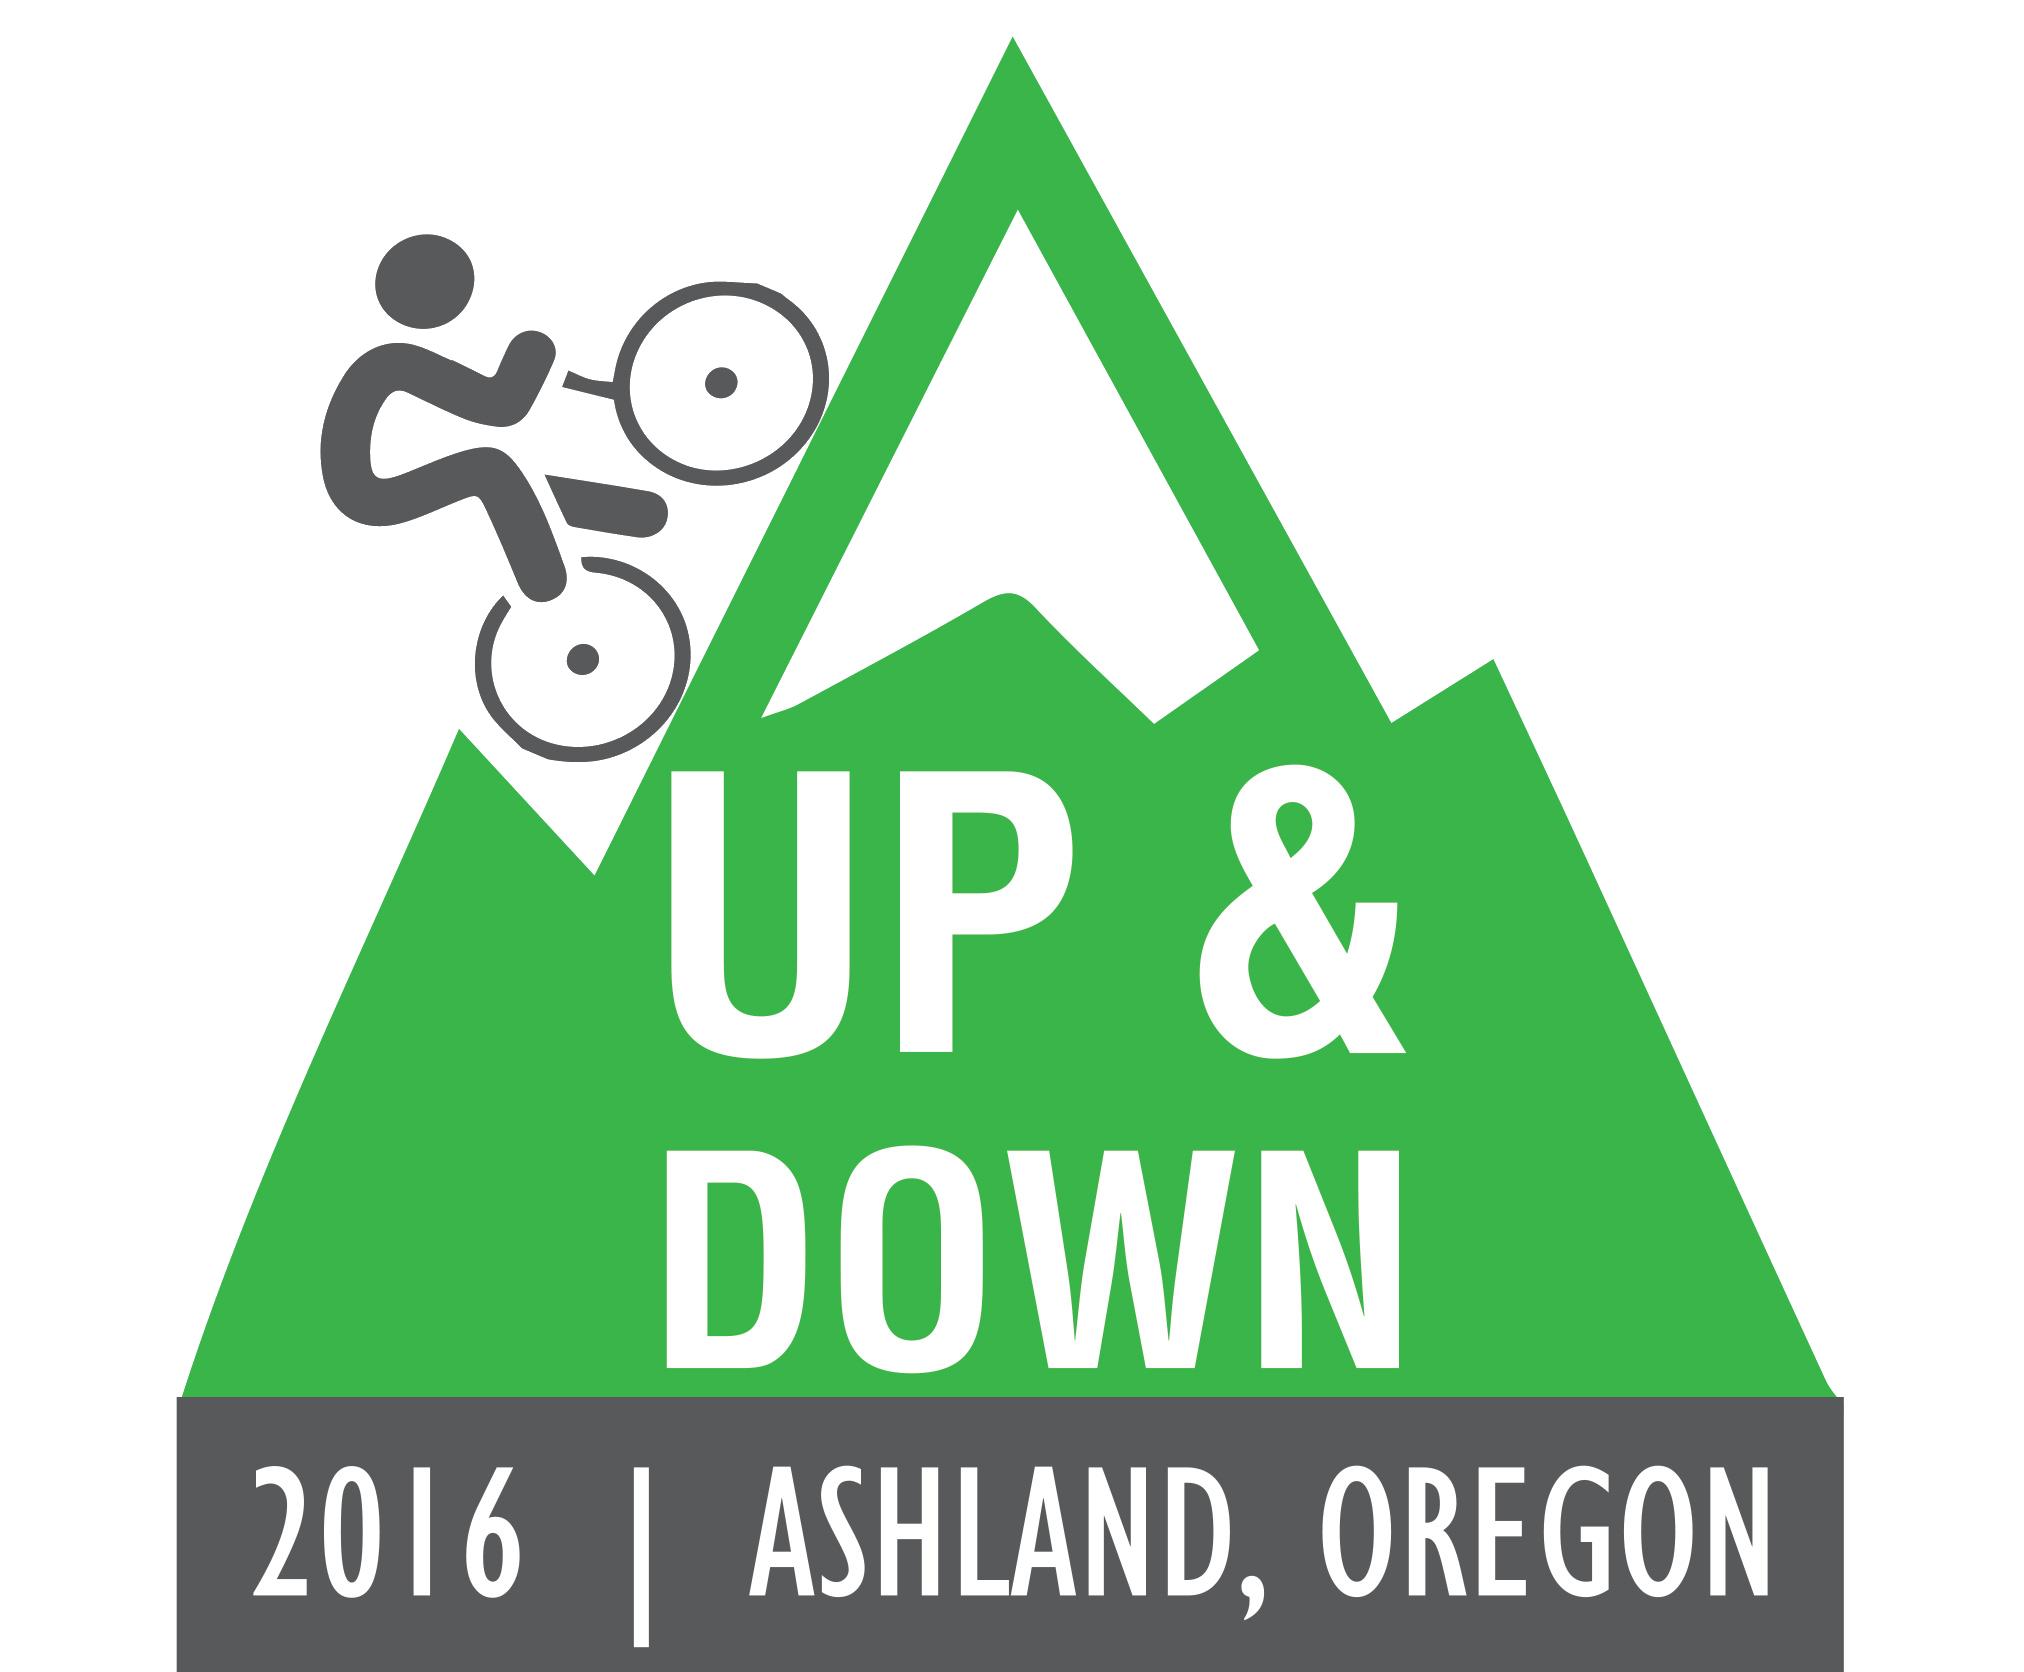 Up & Down Bike Event in Ashland, Oregon